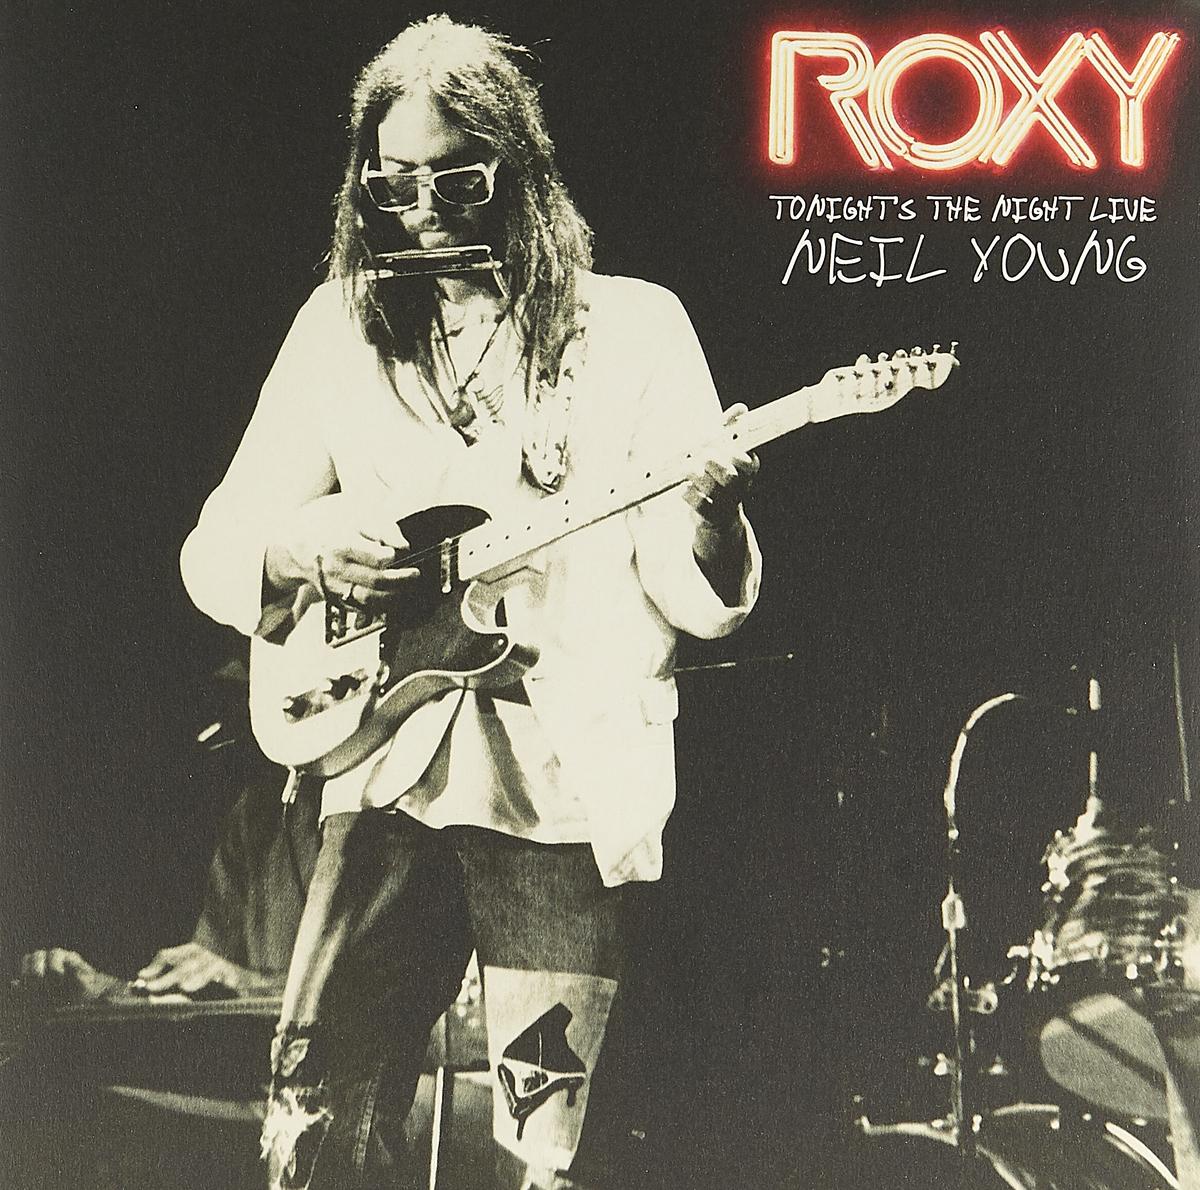 Нил Янг Neil Young. Roxy: Tonight's The Night Live (2 LP)